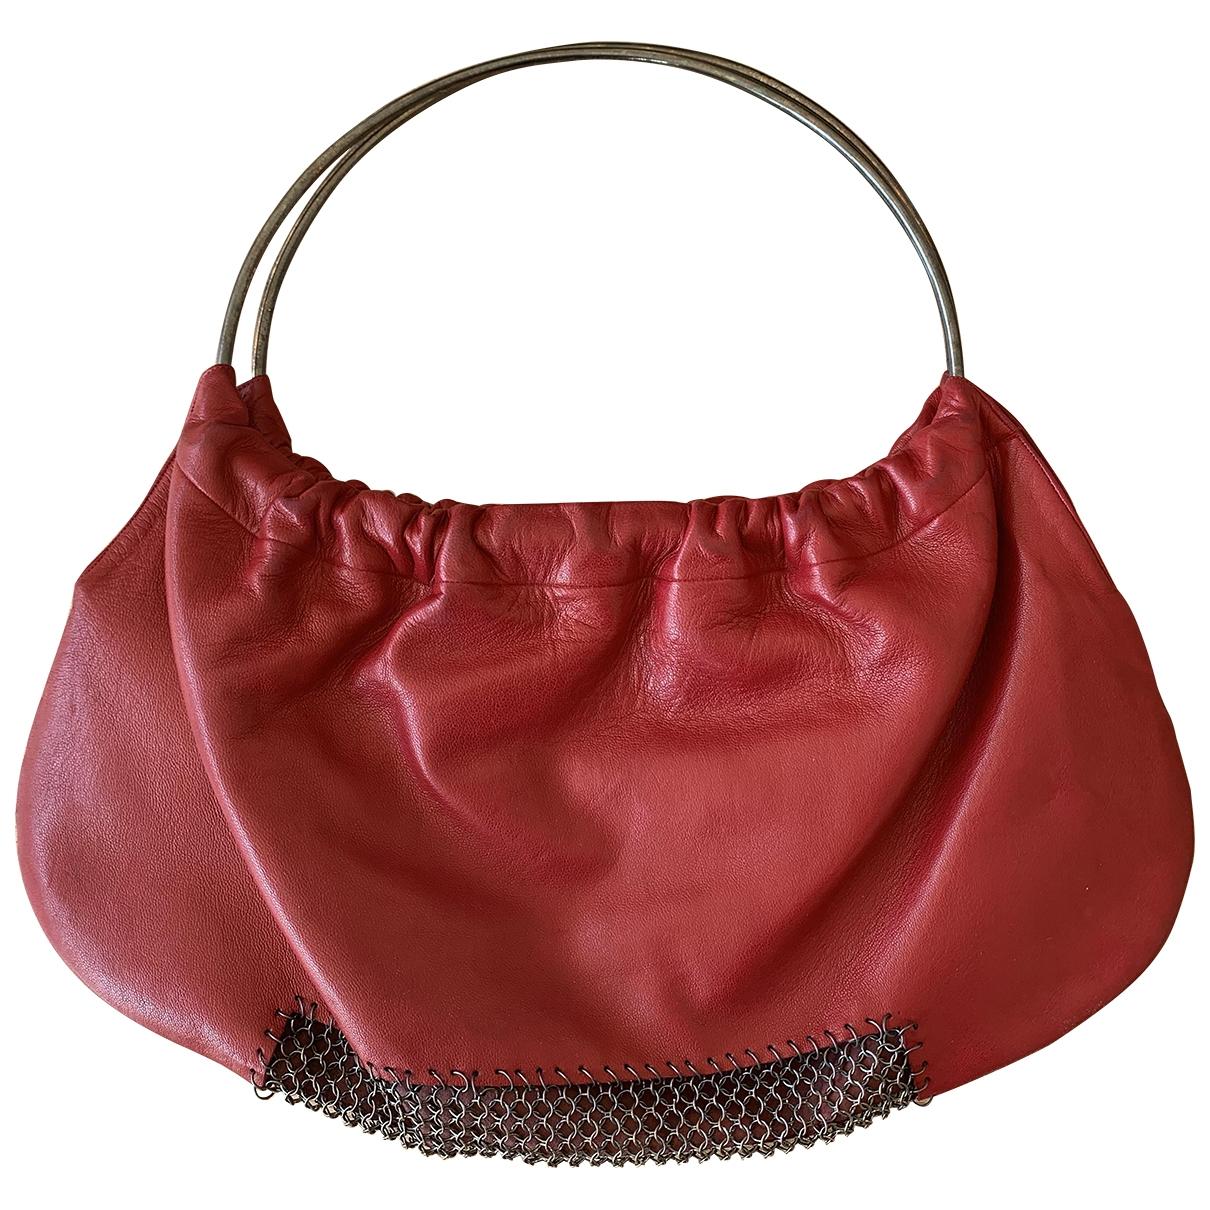 Karine Arabian \N Red Leather handbag for Women \N